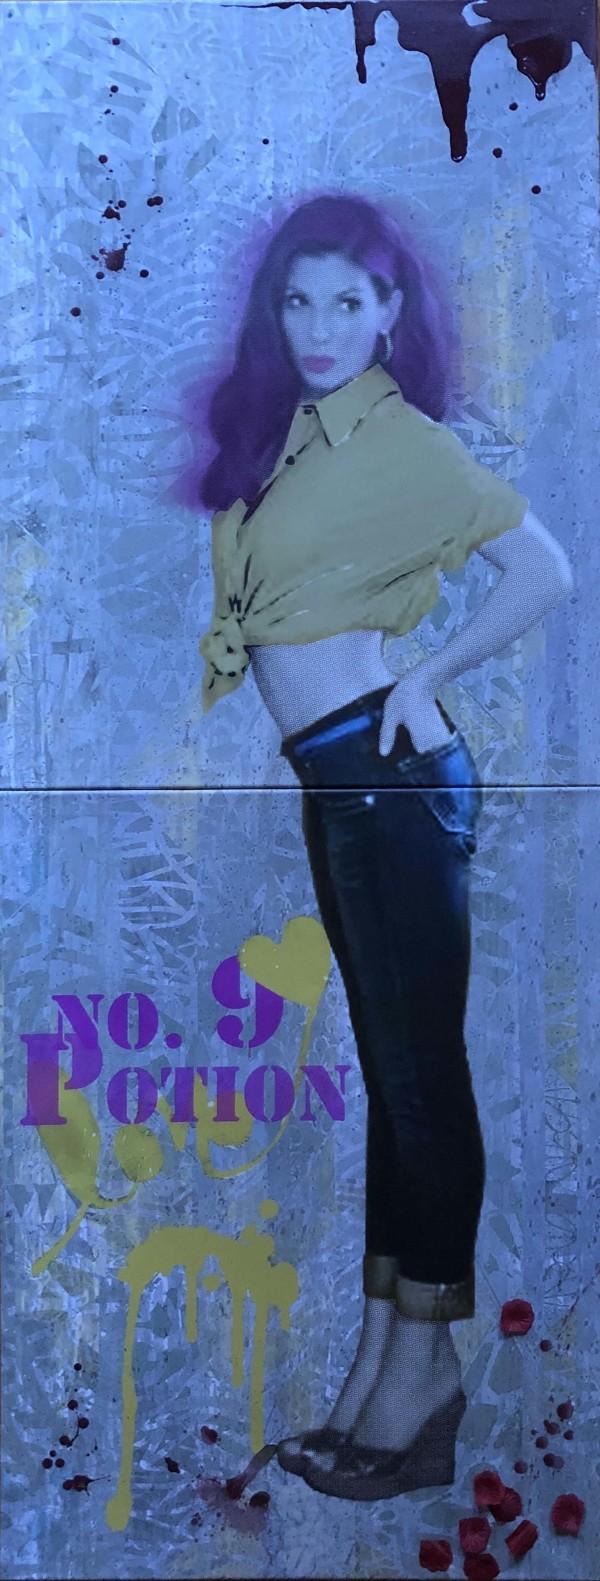 Sandra Love Potion Yellow by Tina Psoinos